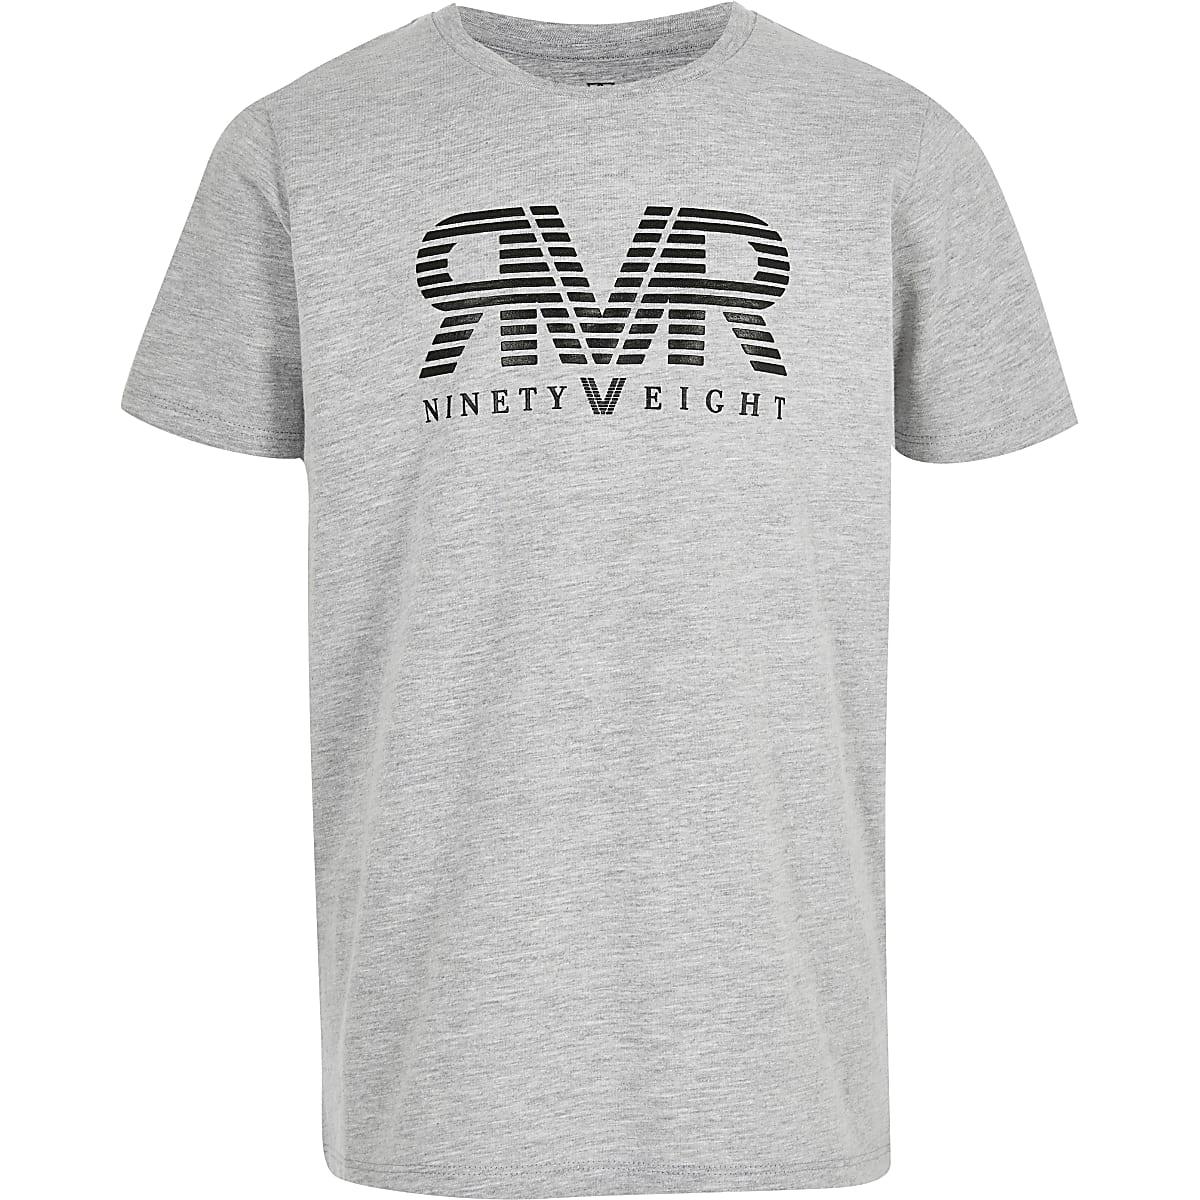 Boys grey ninety eight print T-shirt